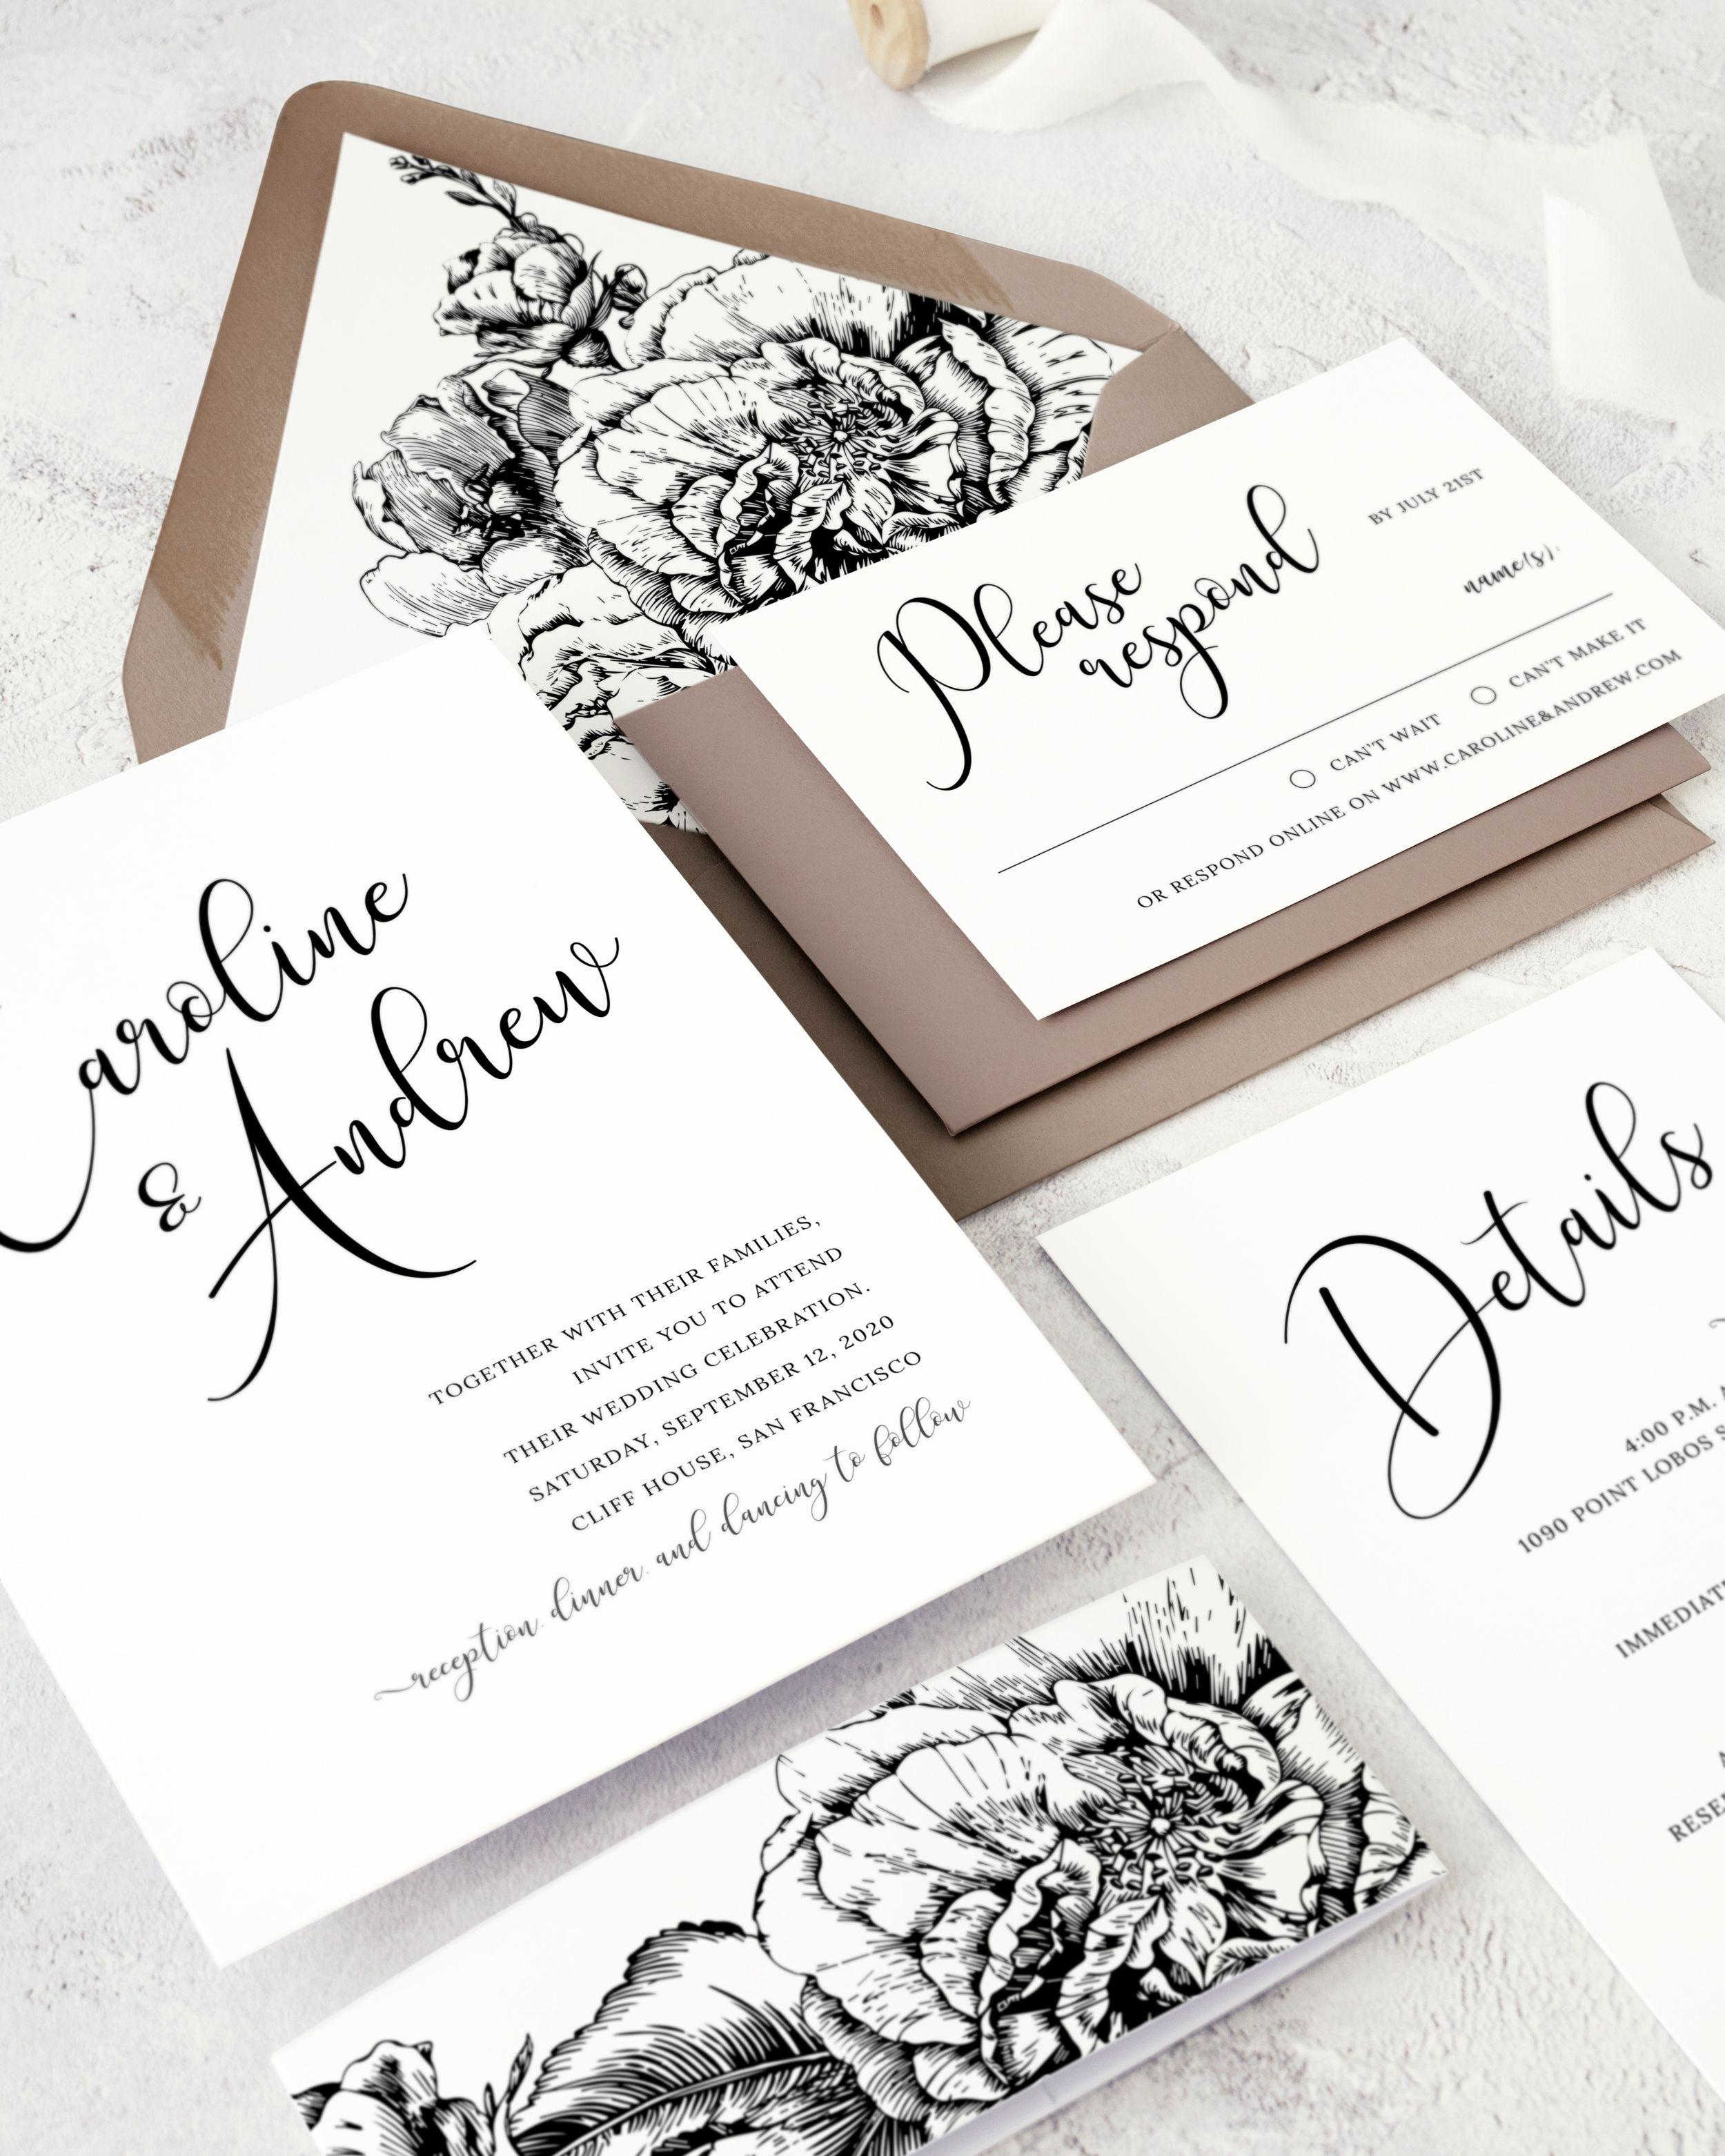 Calligraphy Wedding Invitation Suite Watercolor Floral Etsy In 2020 Calligraphy Wedding Invitation Wedding Invitations Floral Wedding Invitations